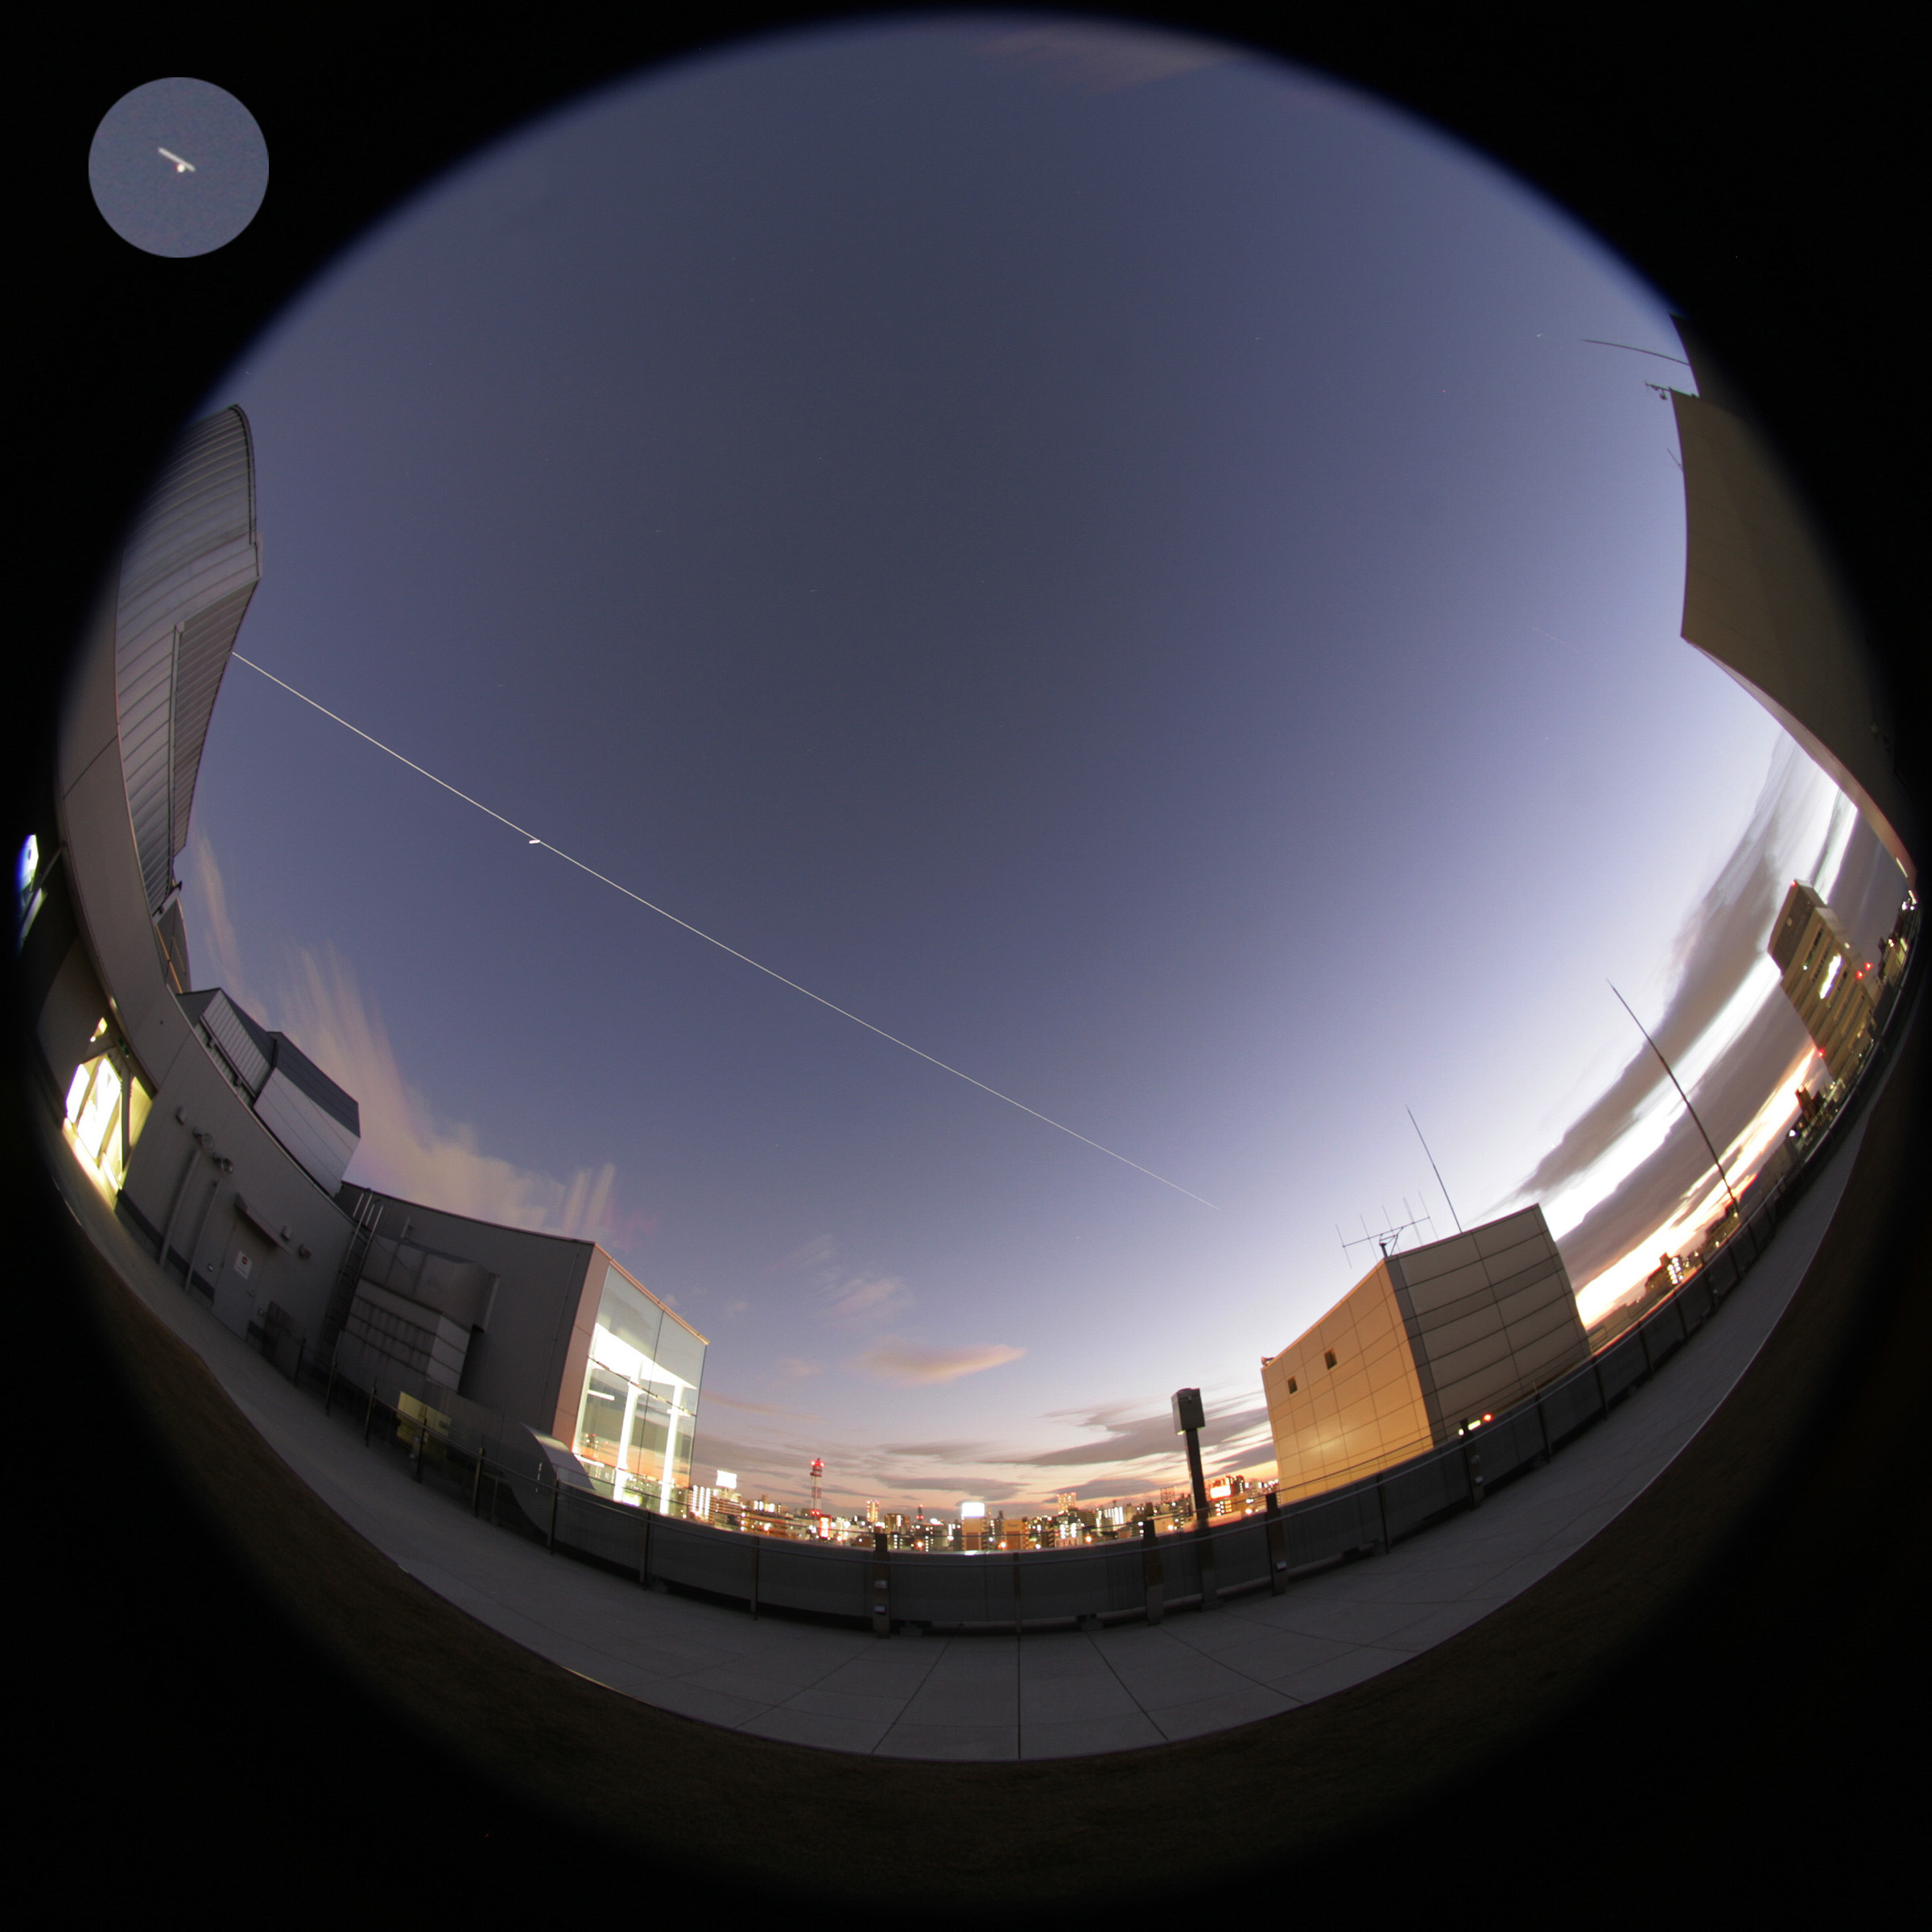 http://www.ncsm.city.nagoya.jp/study/astro/20111217_4202-4272_m.jpg